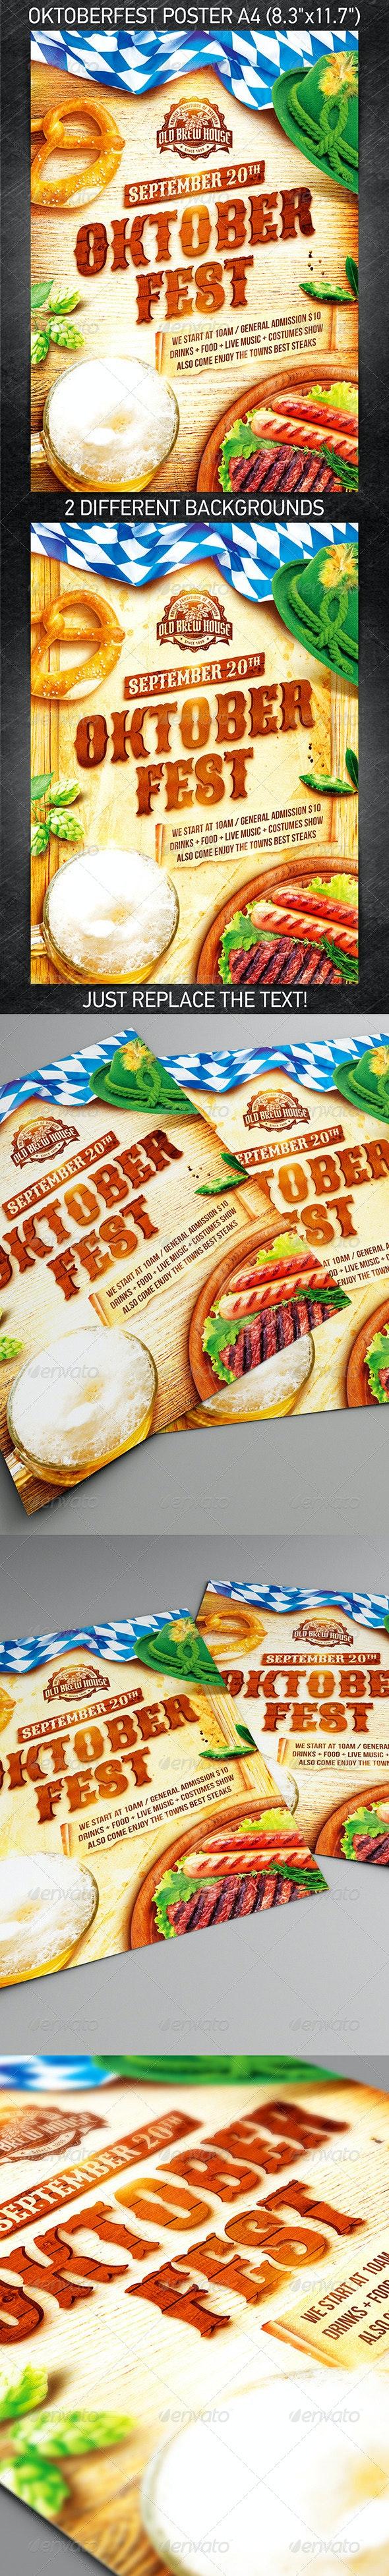 Oktoberfest Festival Poster vol.3 - Holidays Events